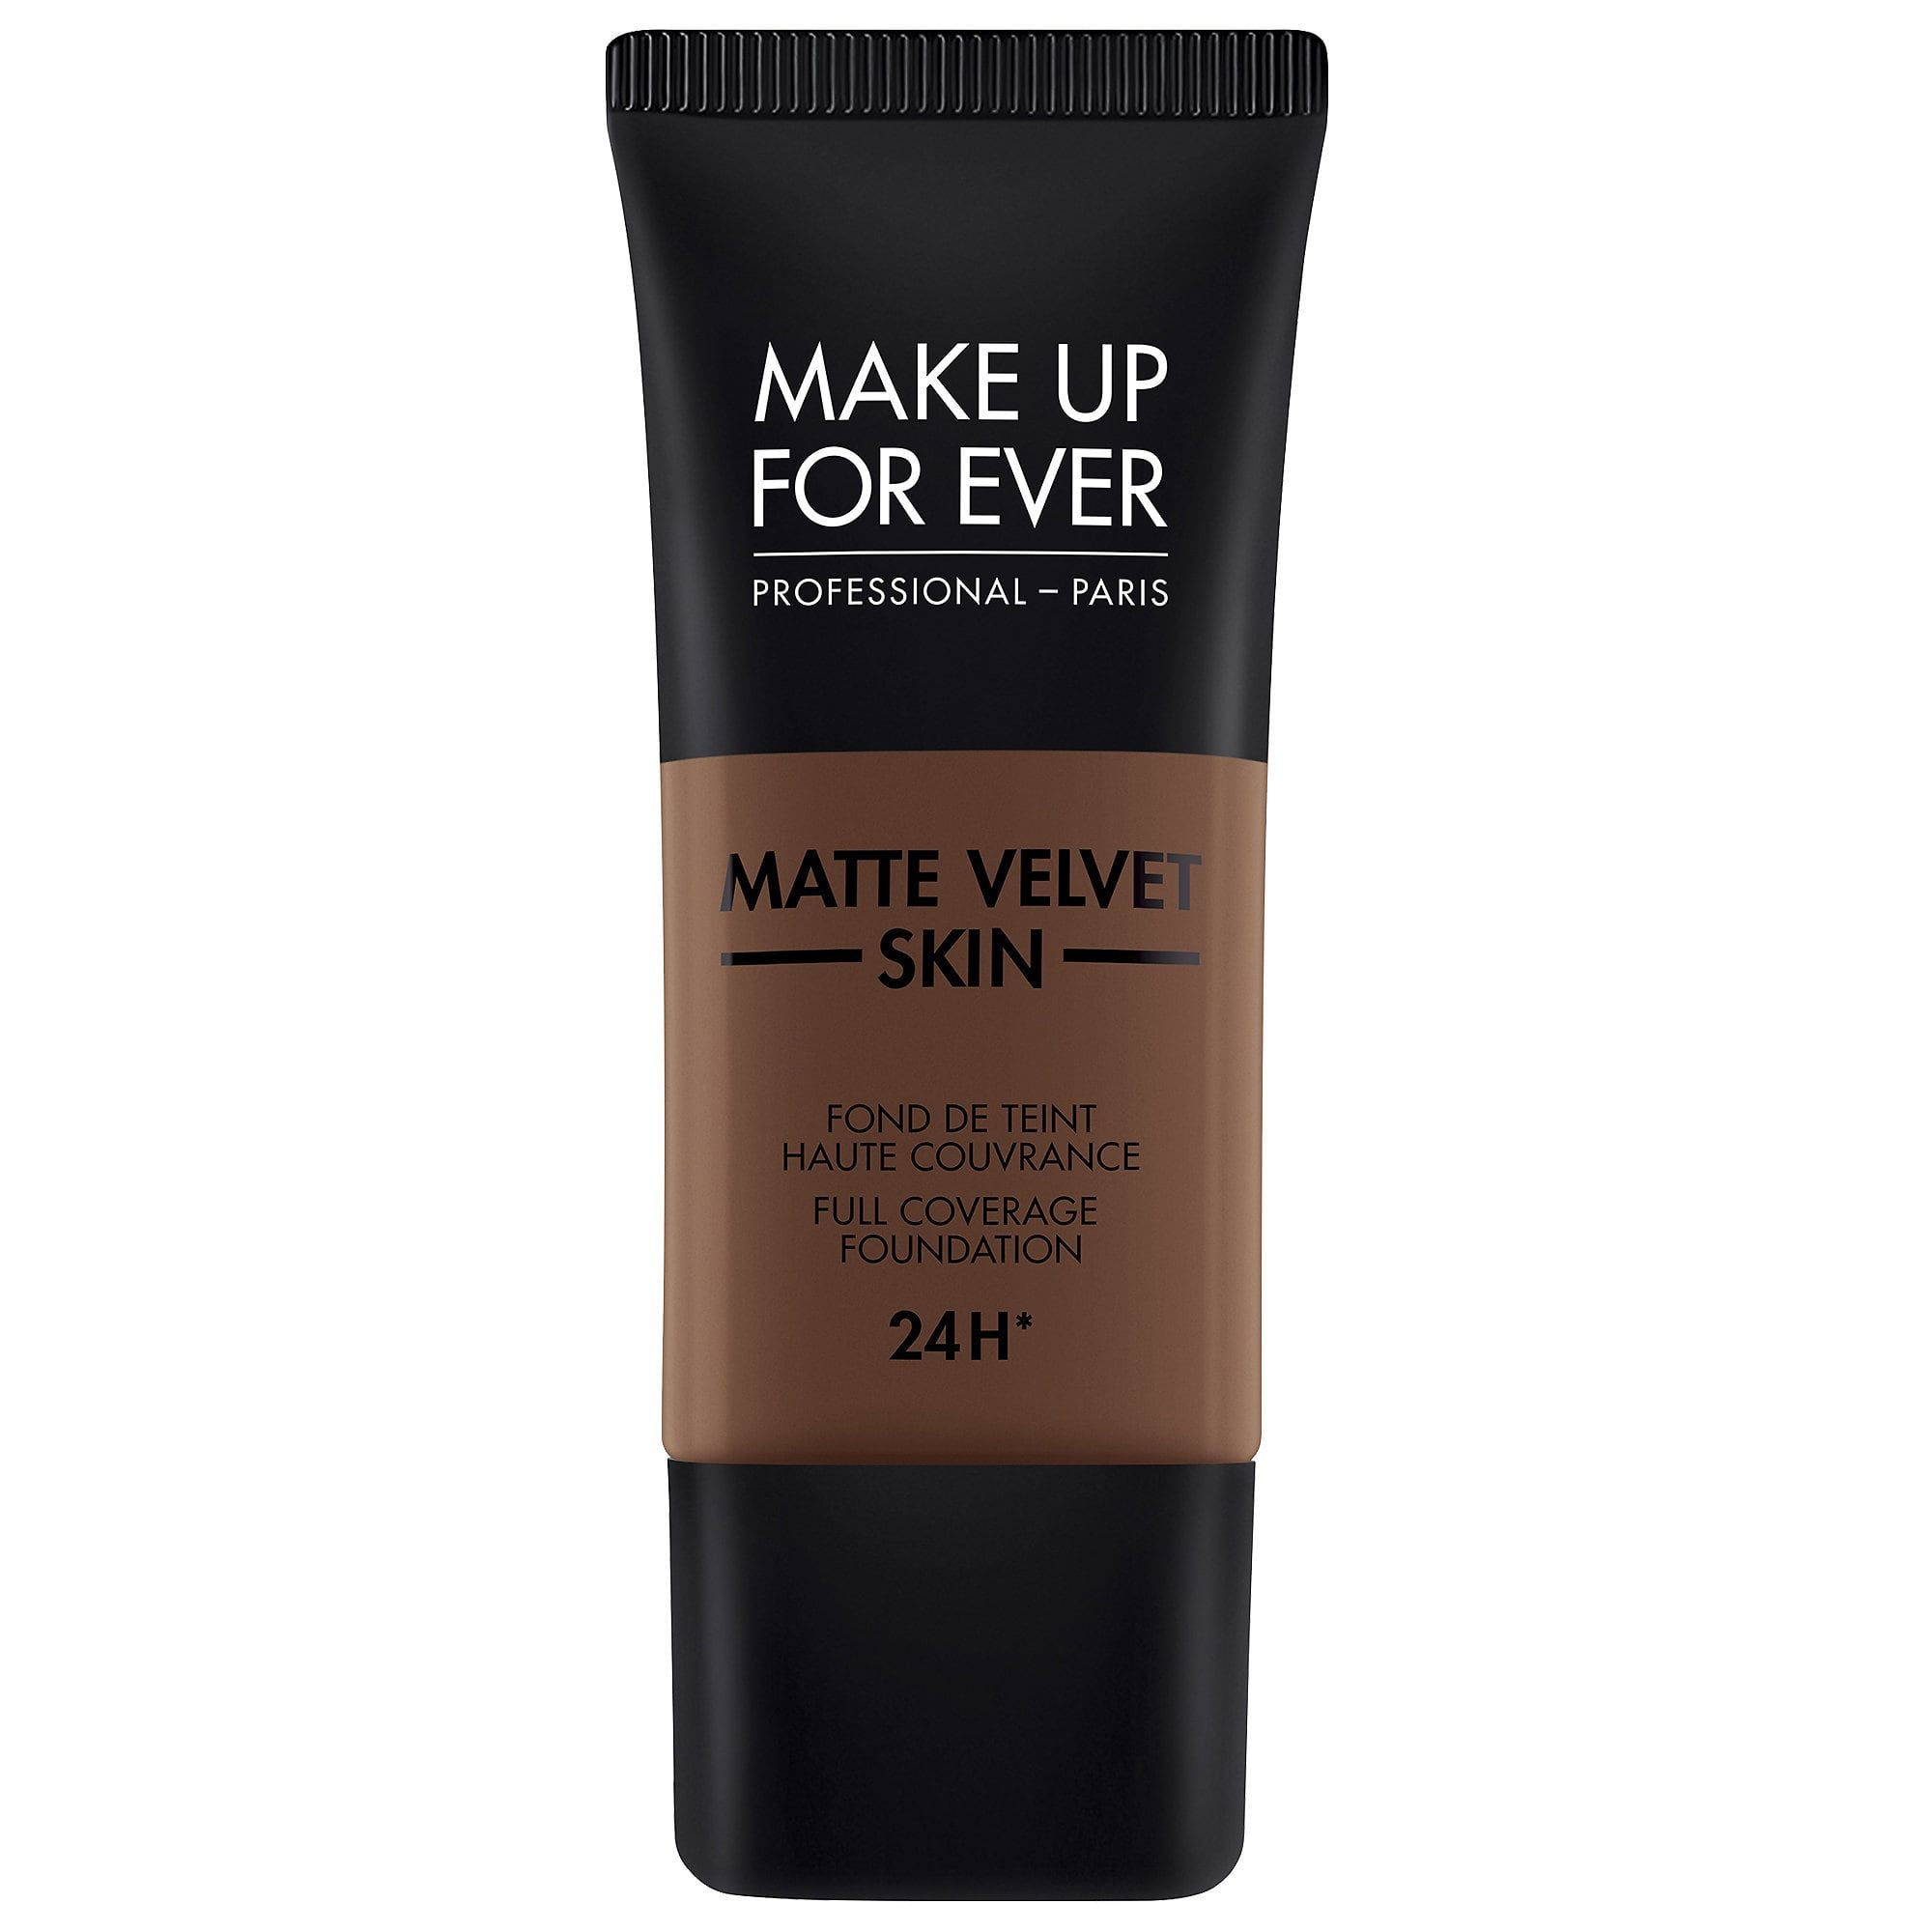 Cream based foundation for oily skin